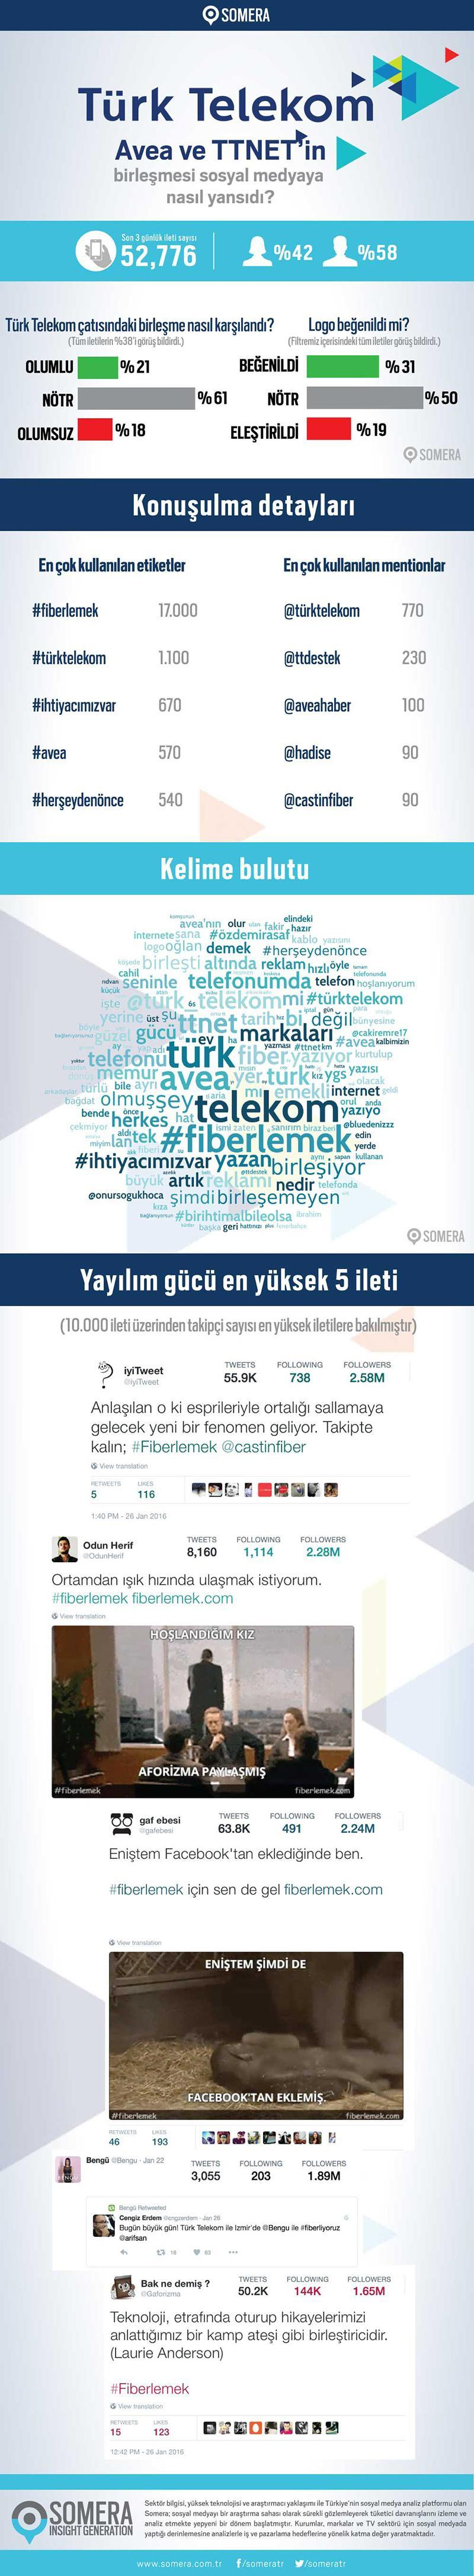 turk telekom avea ttnet